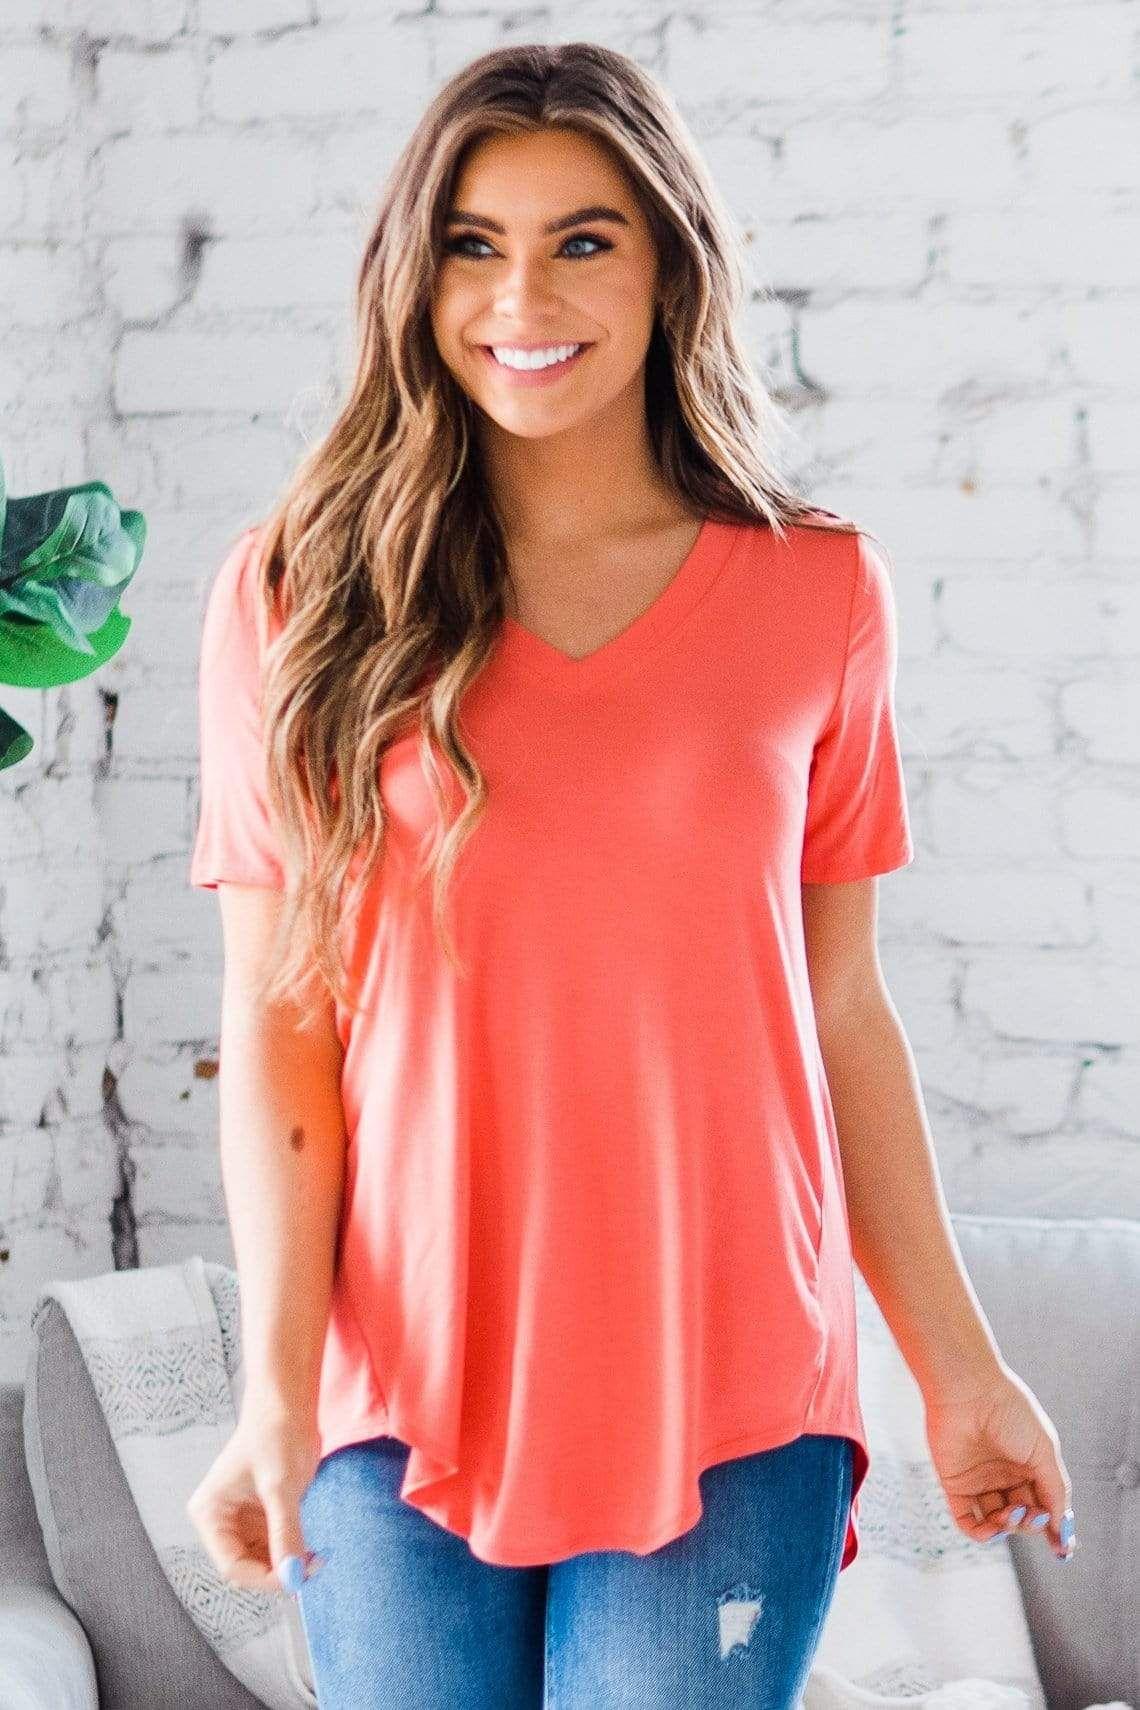 women's v neck tee shirts